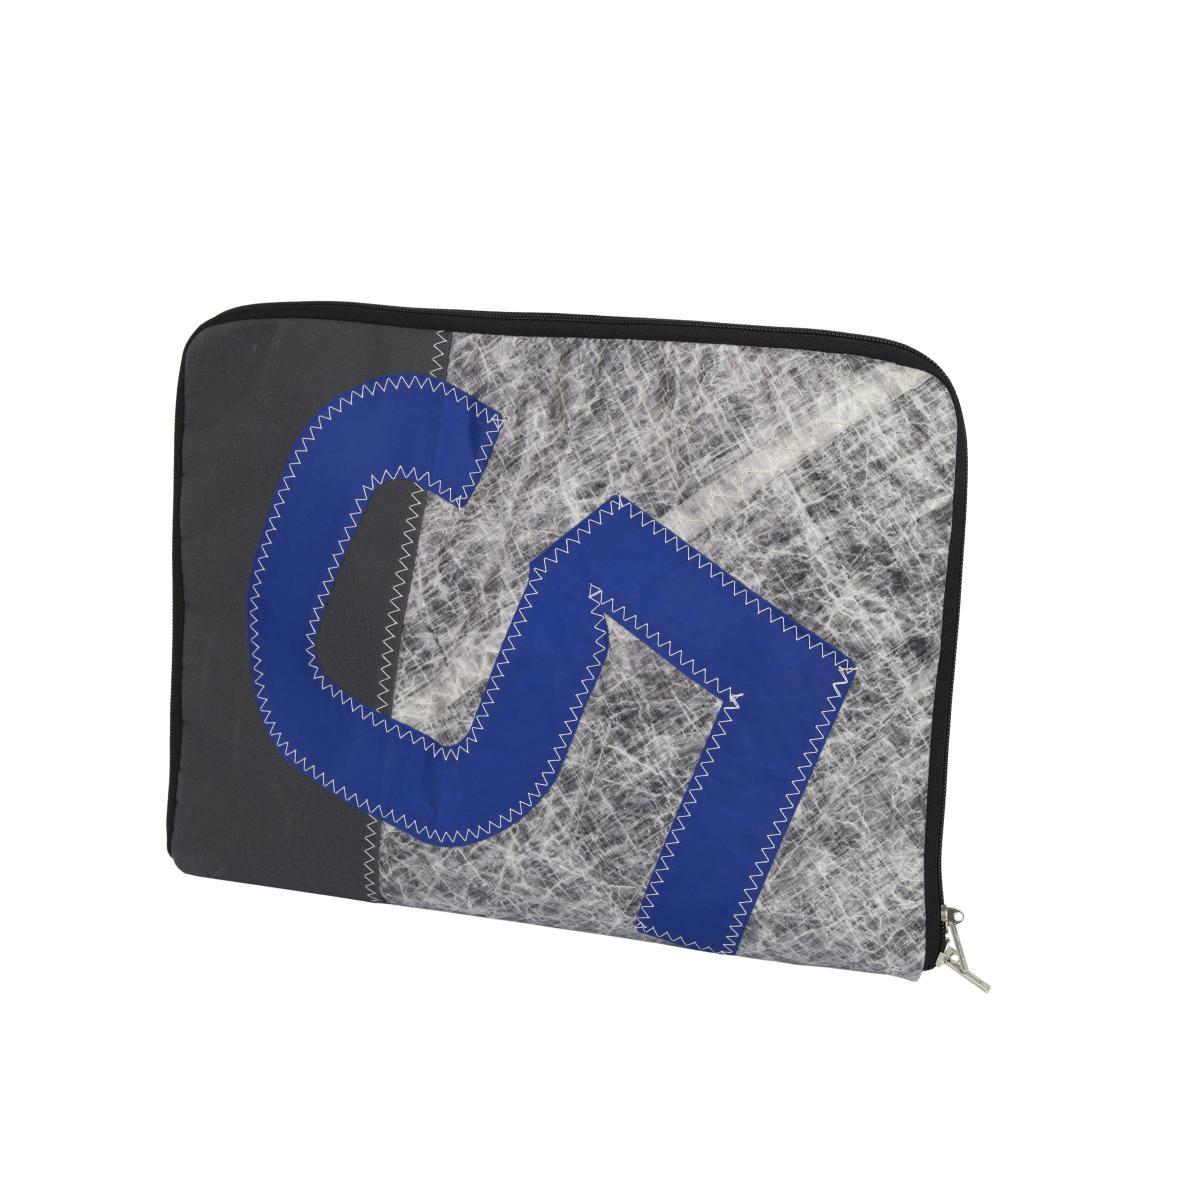 Harry Laptop Tasche / Sleeve TechSail, 13 Zoll Nr. 5 blau